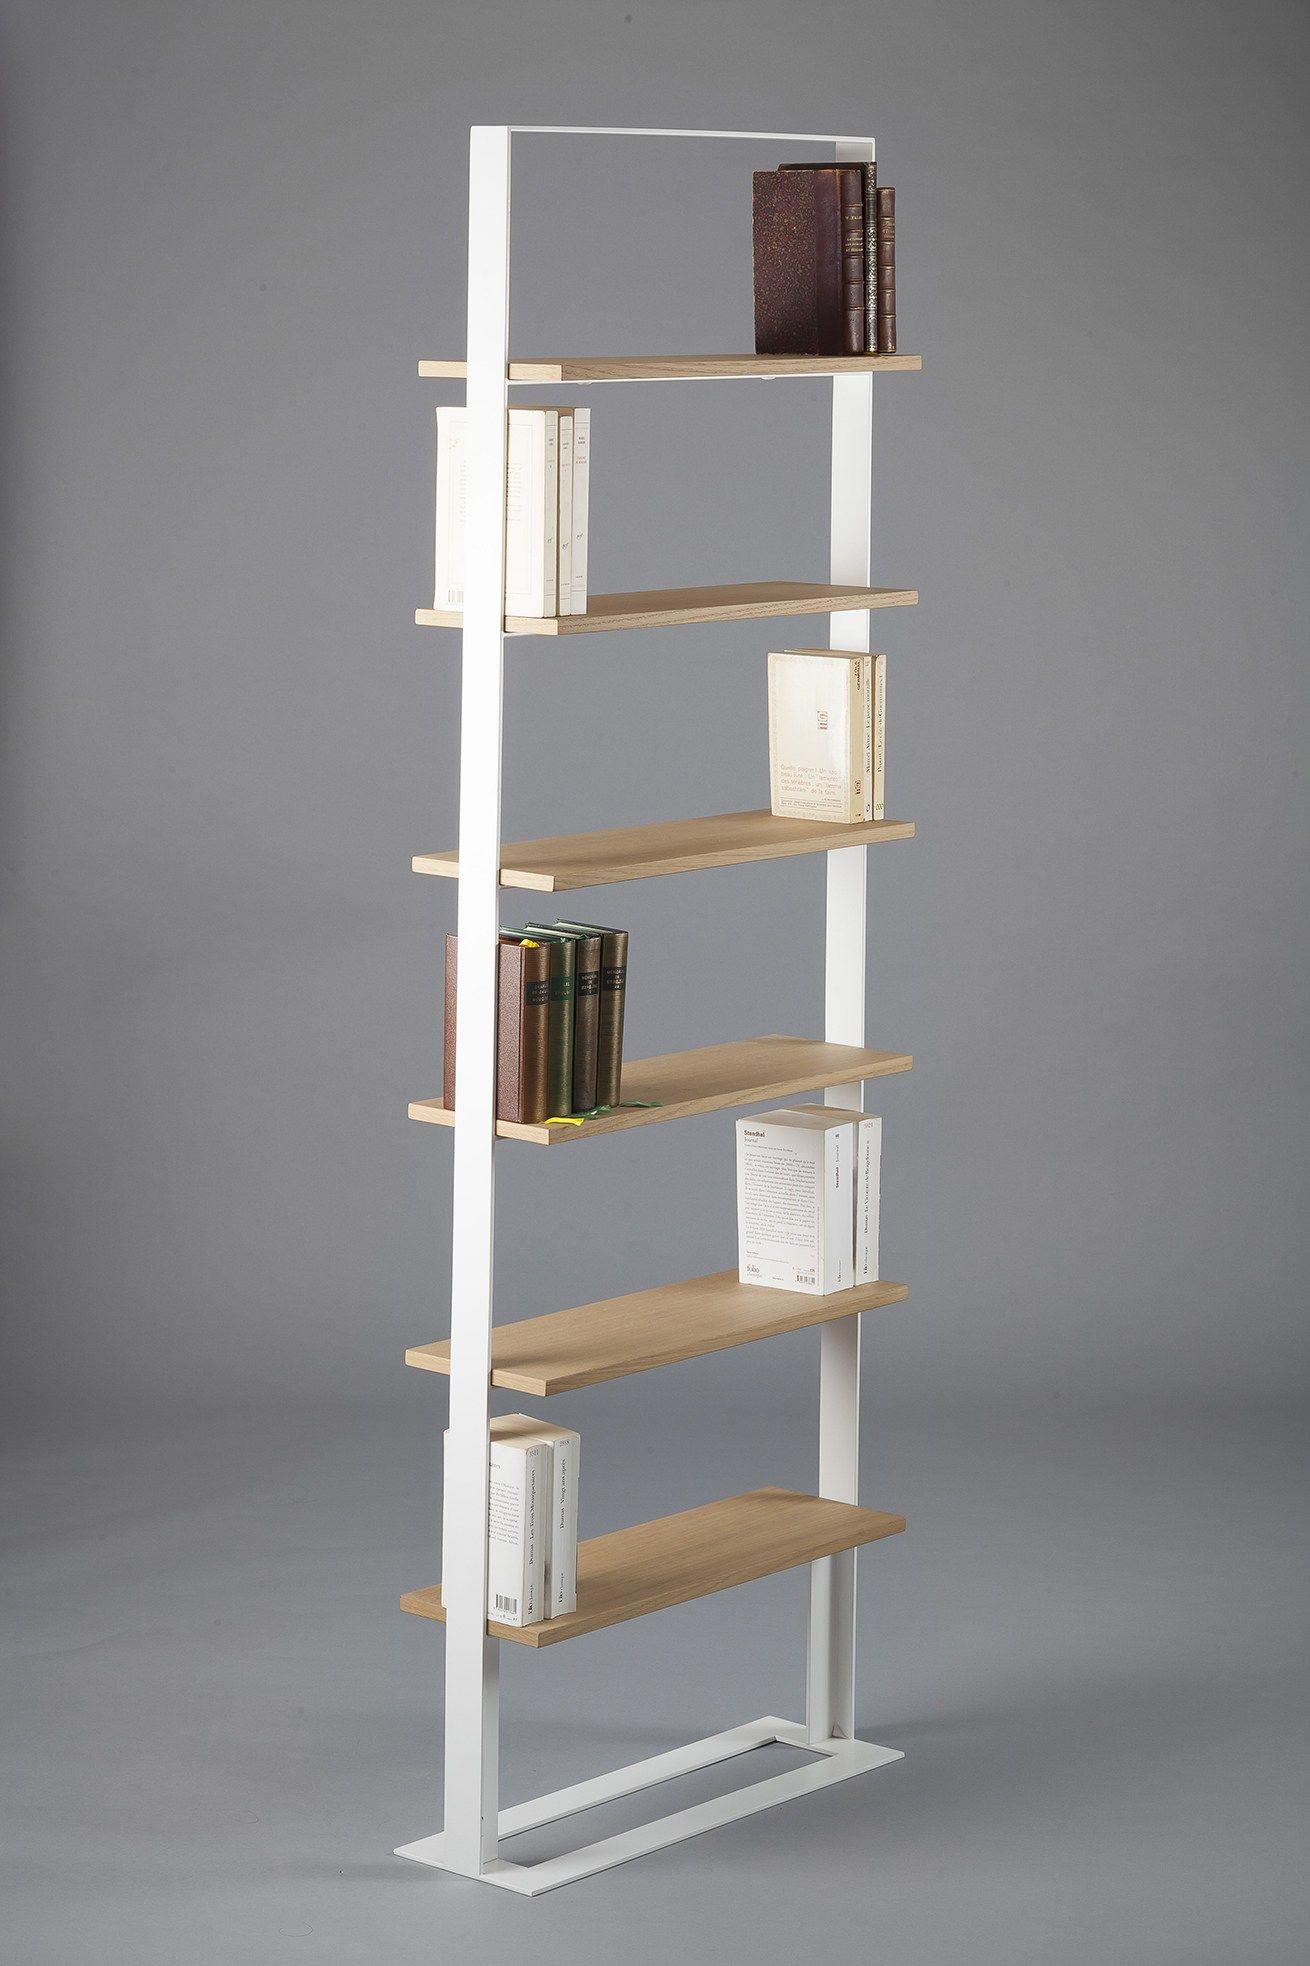 s verin 2 by alex de rouvray design design alex de rouvray. Black Bedroom Furniture Sets. Home Design Ideas